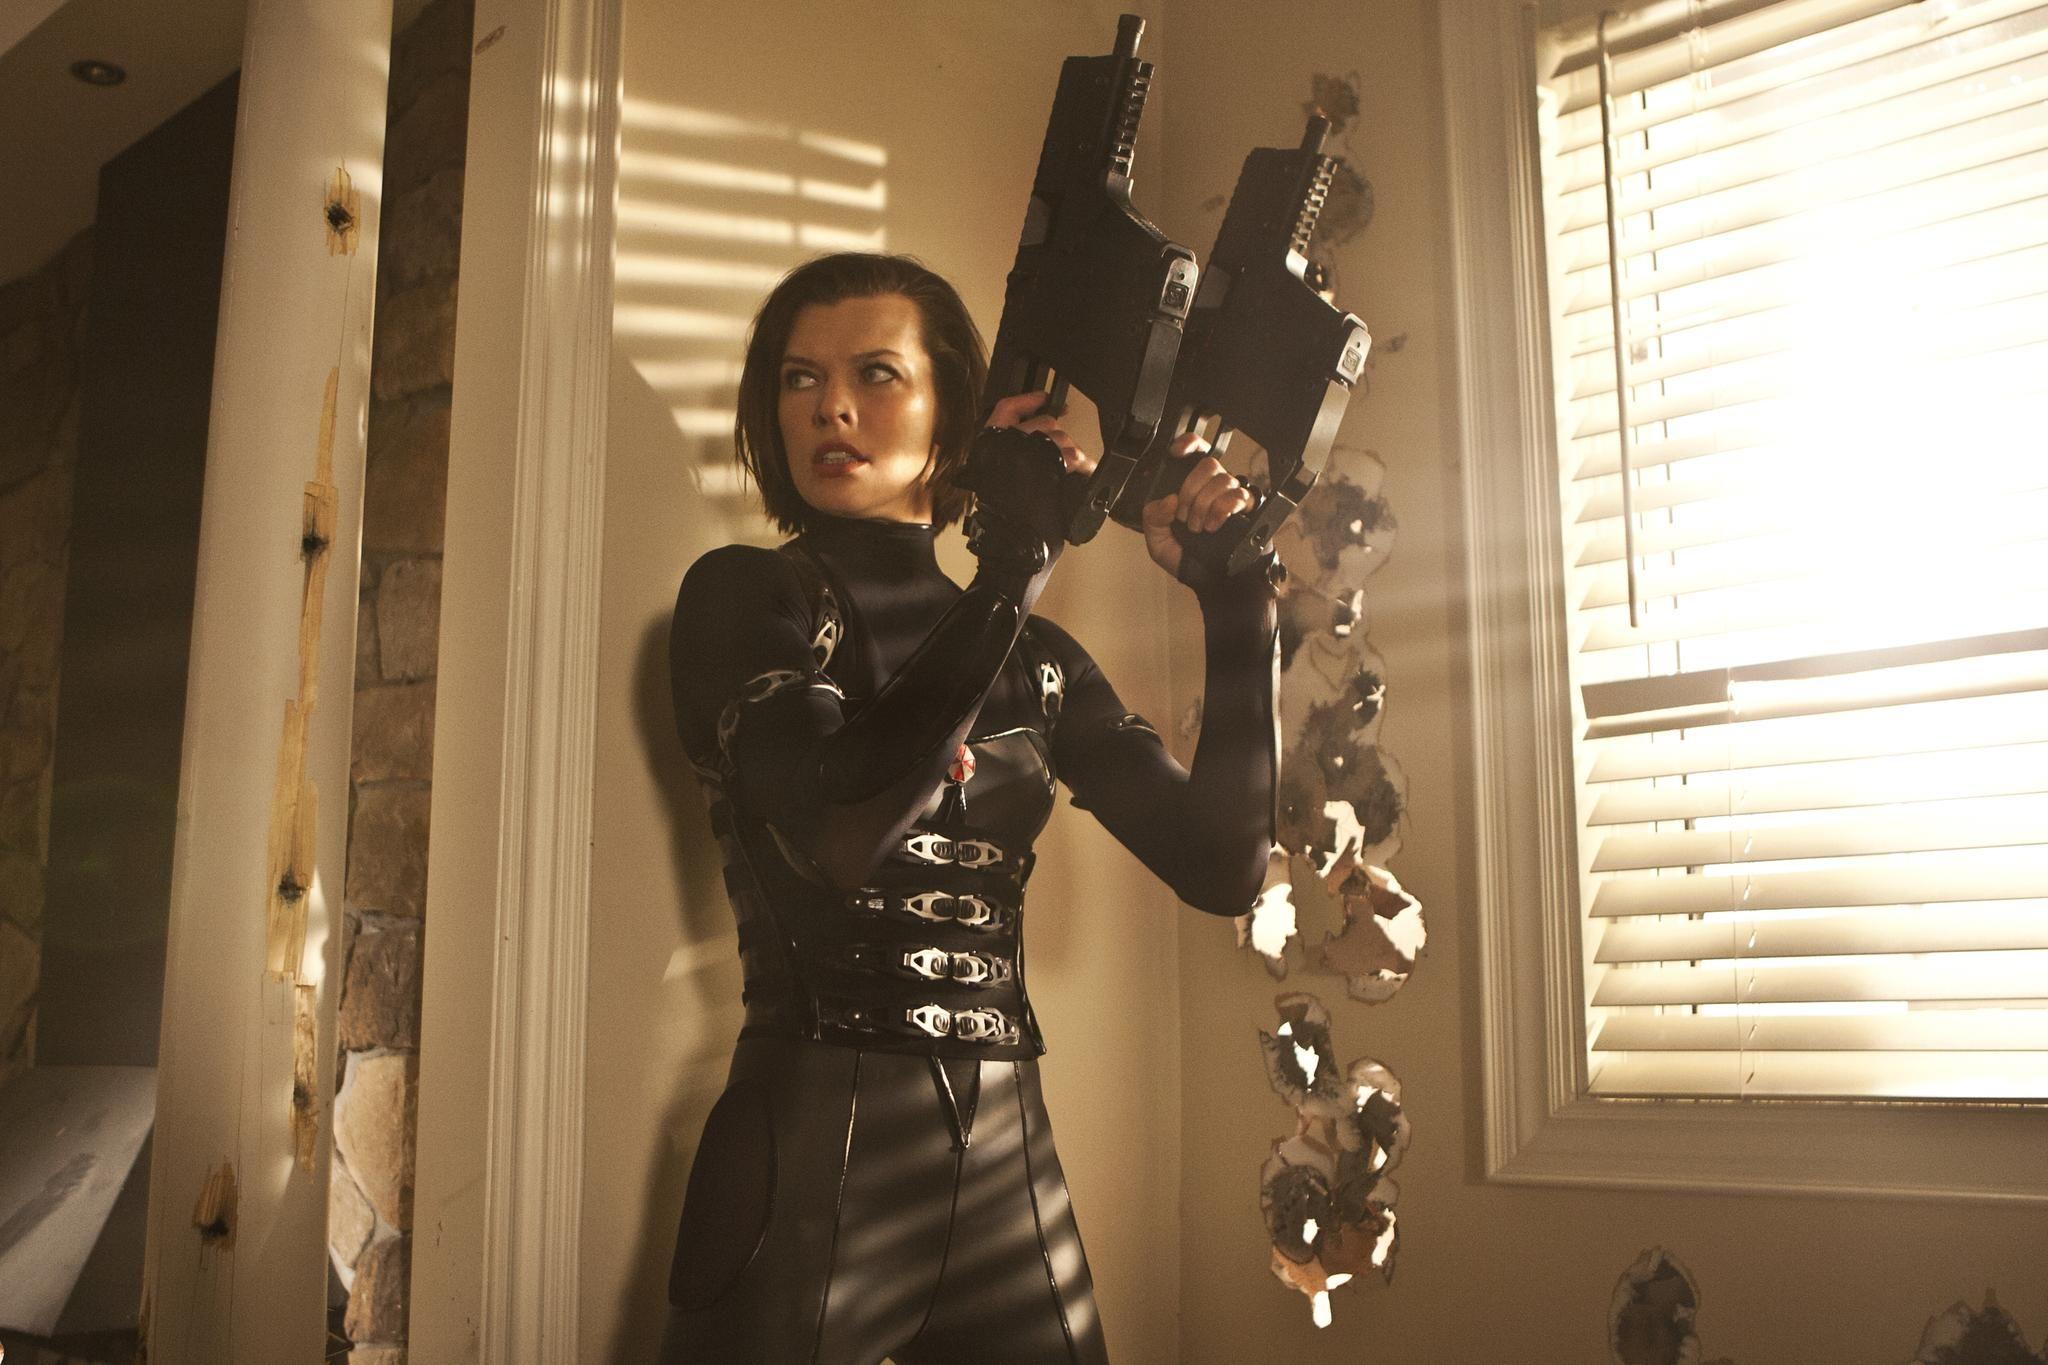 Are not Resident evil movie girl accept